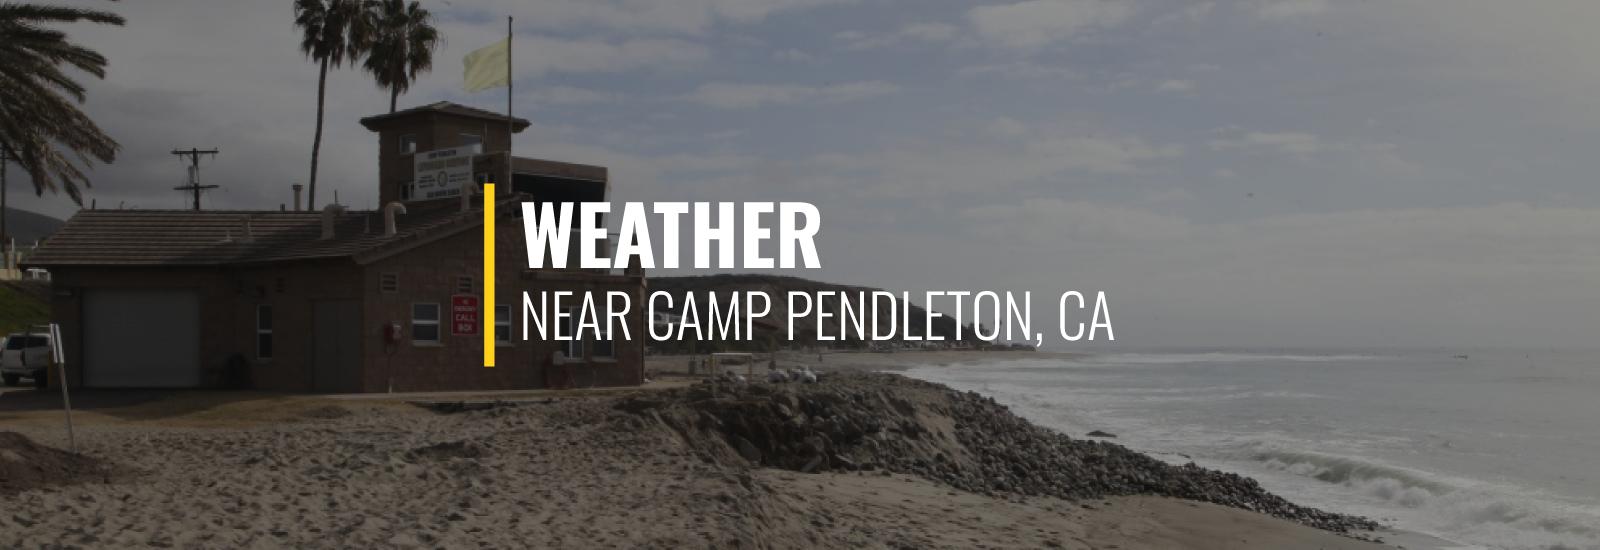 Camp Pendleton California Weather